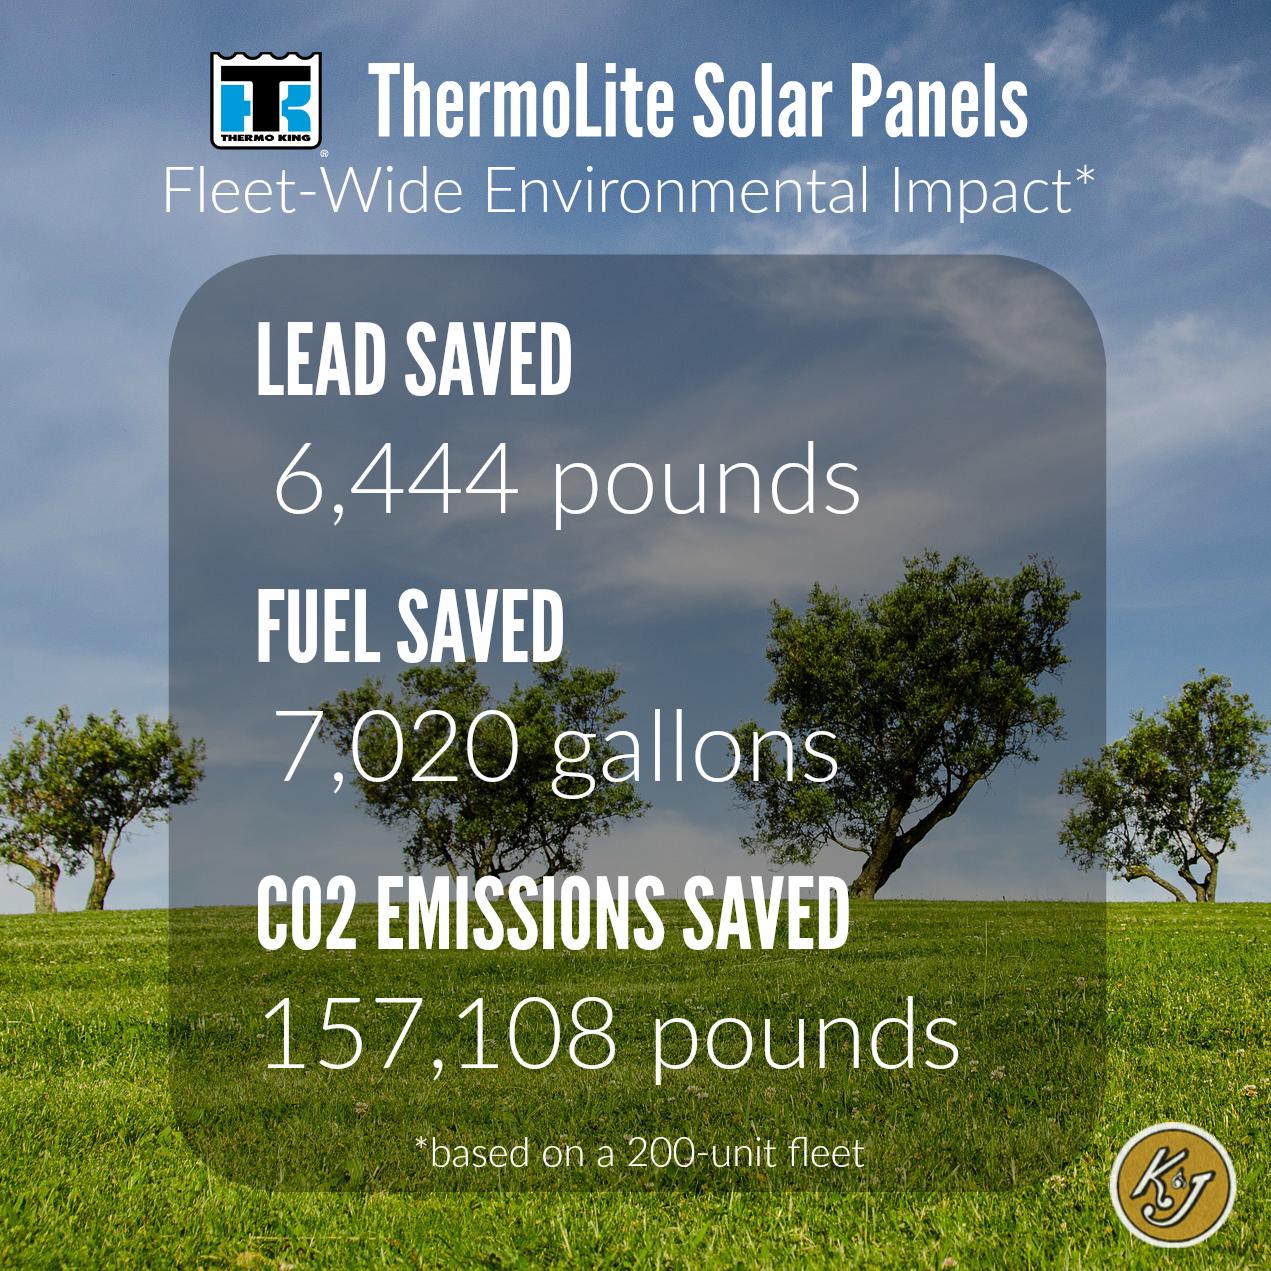 ThermoLite Solar Panels - Fleet-Wide Environmental Impact - K&J Trucking